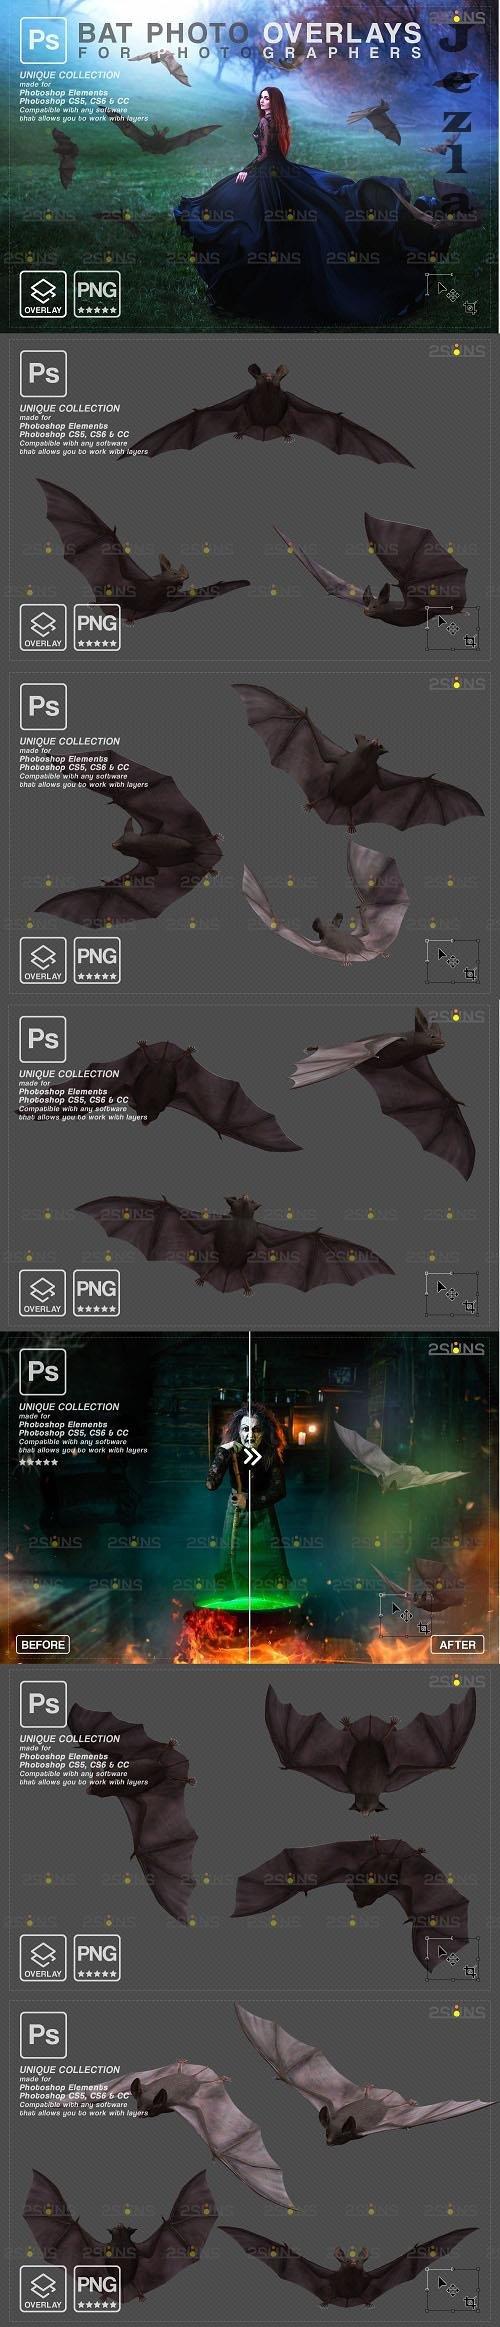 Halloween overlay PHSP overlay Realistic bat clipart - 1447939